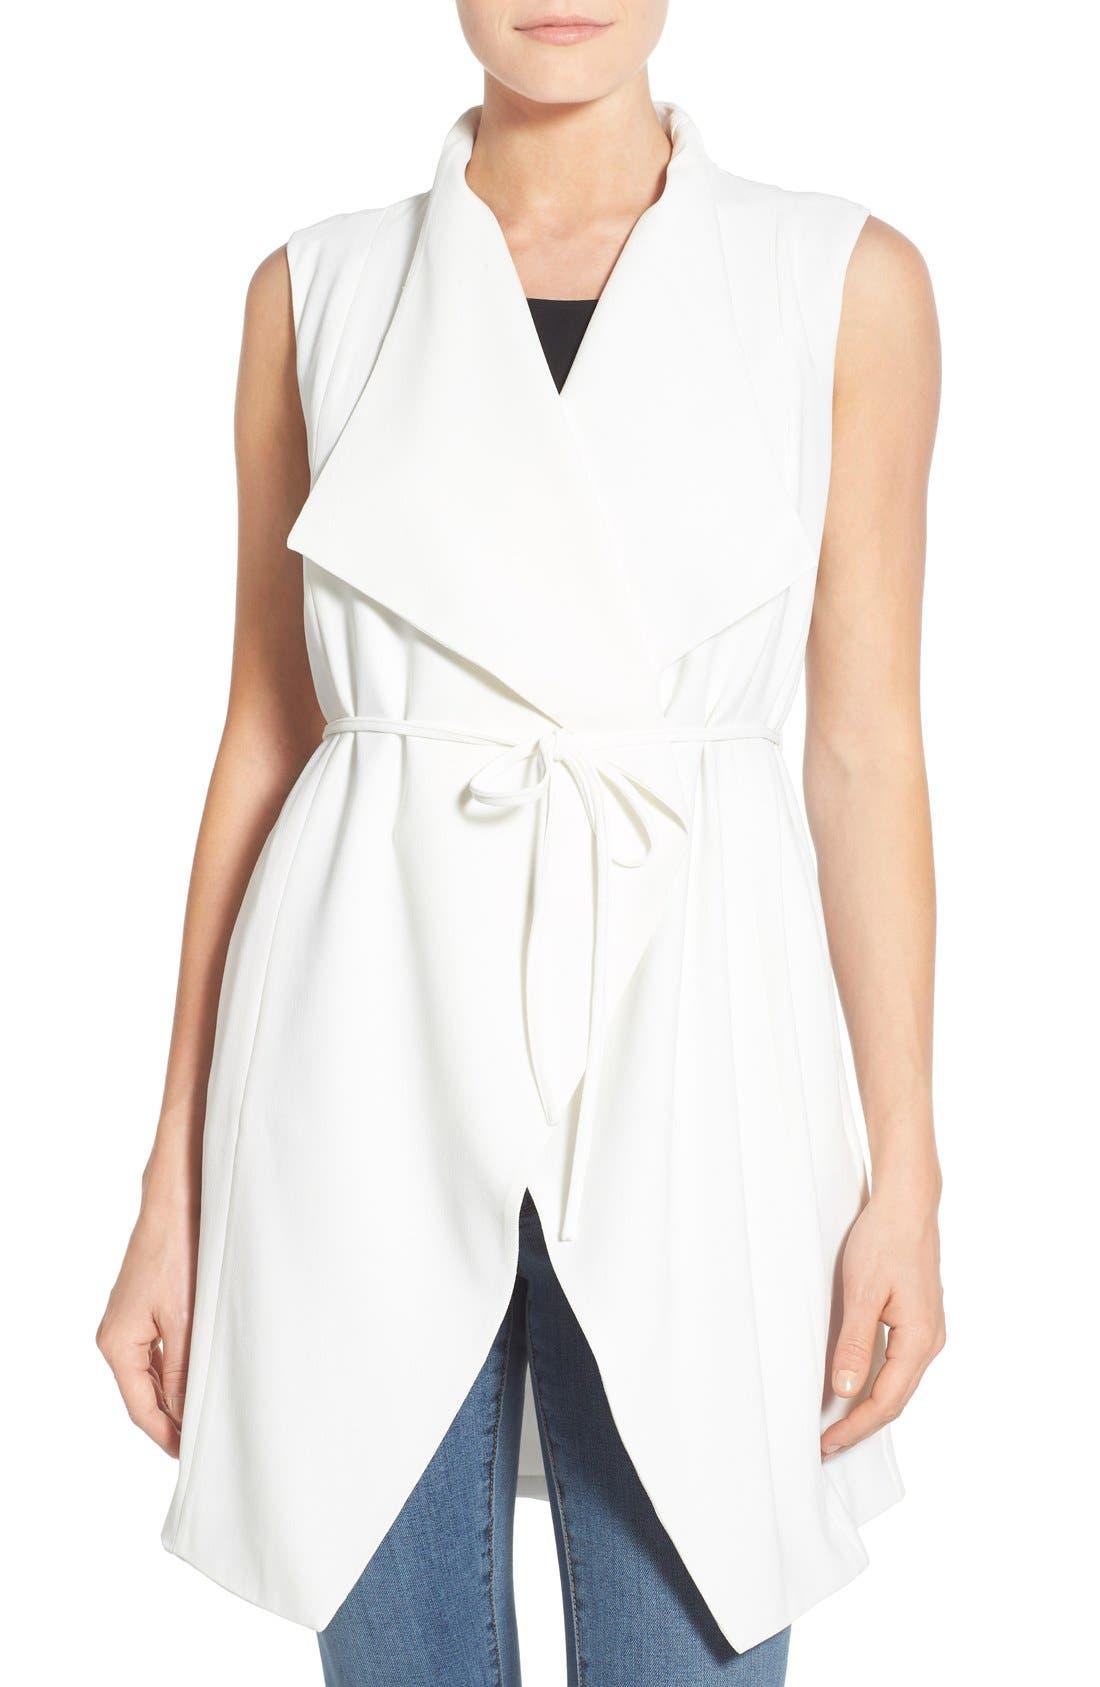 Alternate Image 1 Selected - Catherine Catherine Malandrino 'Quindon' Longline Vest